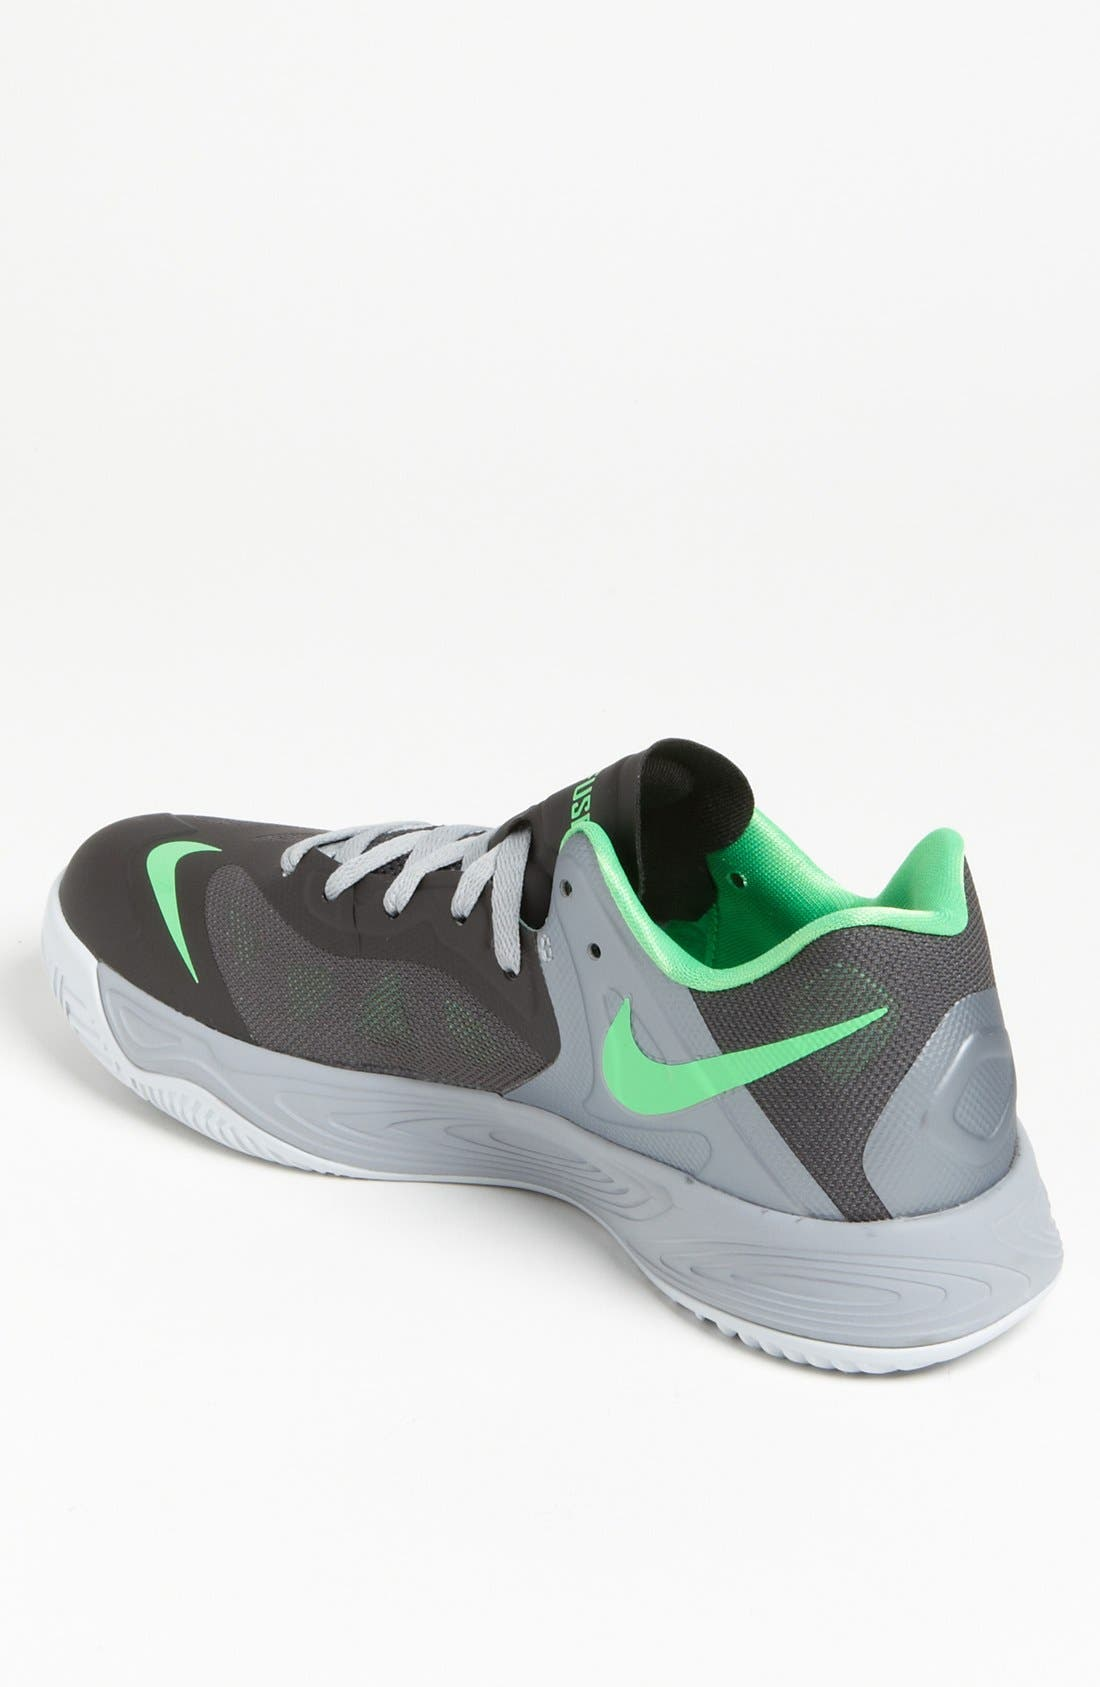 NIKE,                             'Hyperfuse Low' Basketball Shoe,                             Alternate thumbnail 3, color,                             004